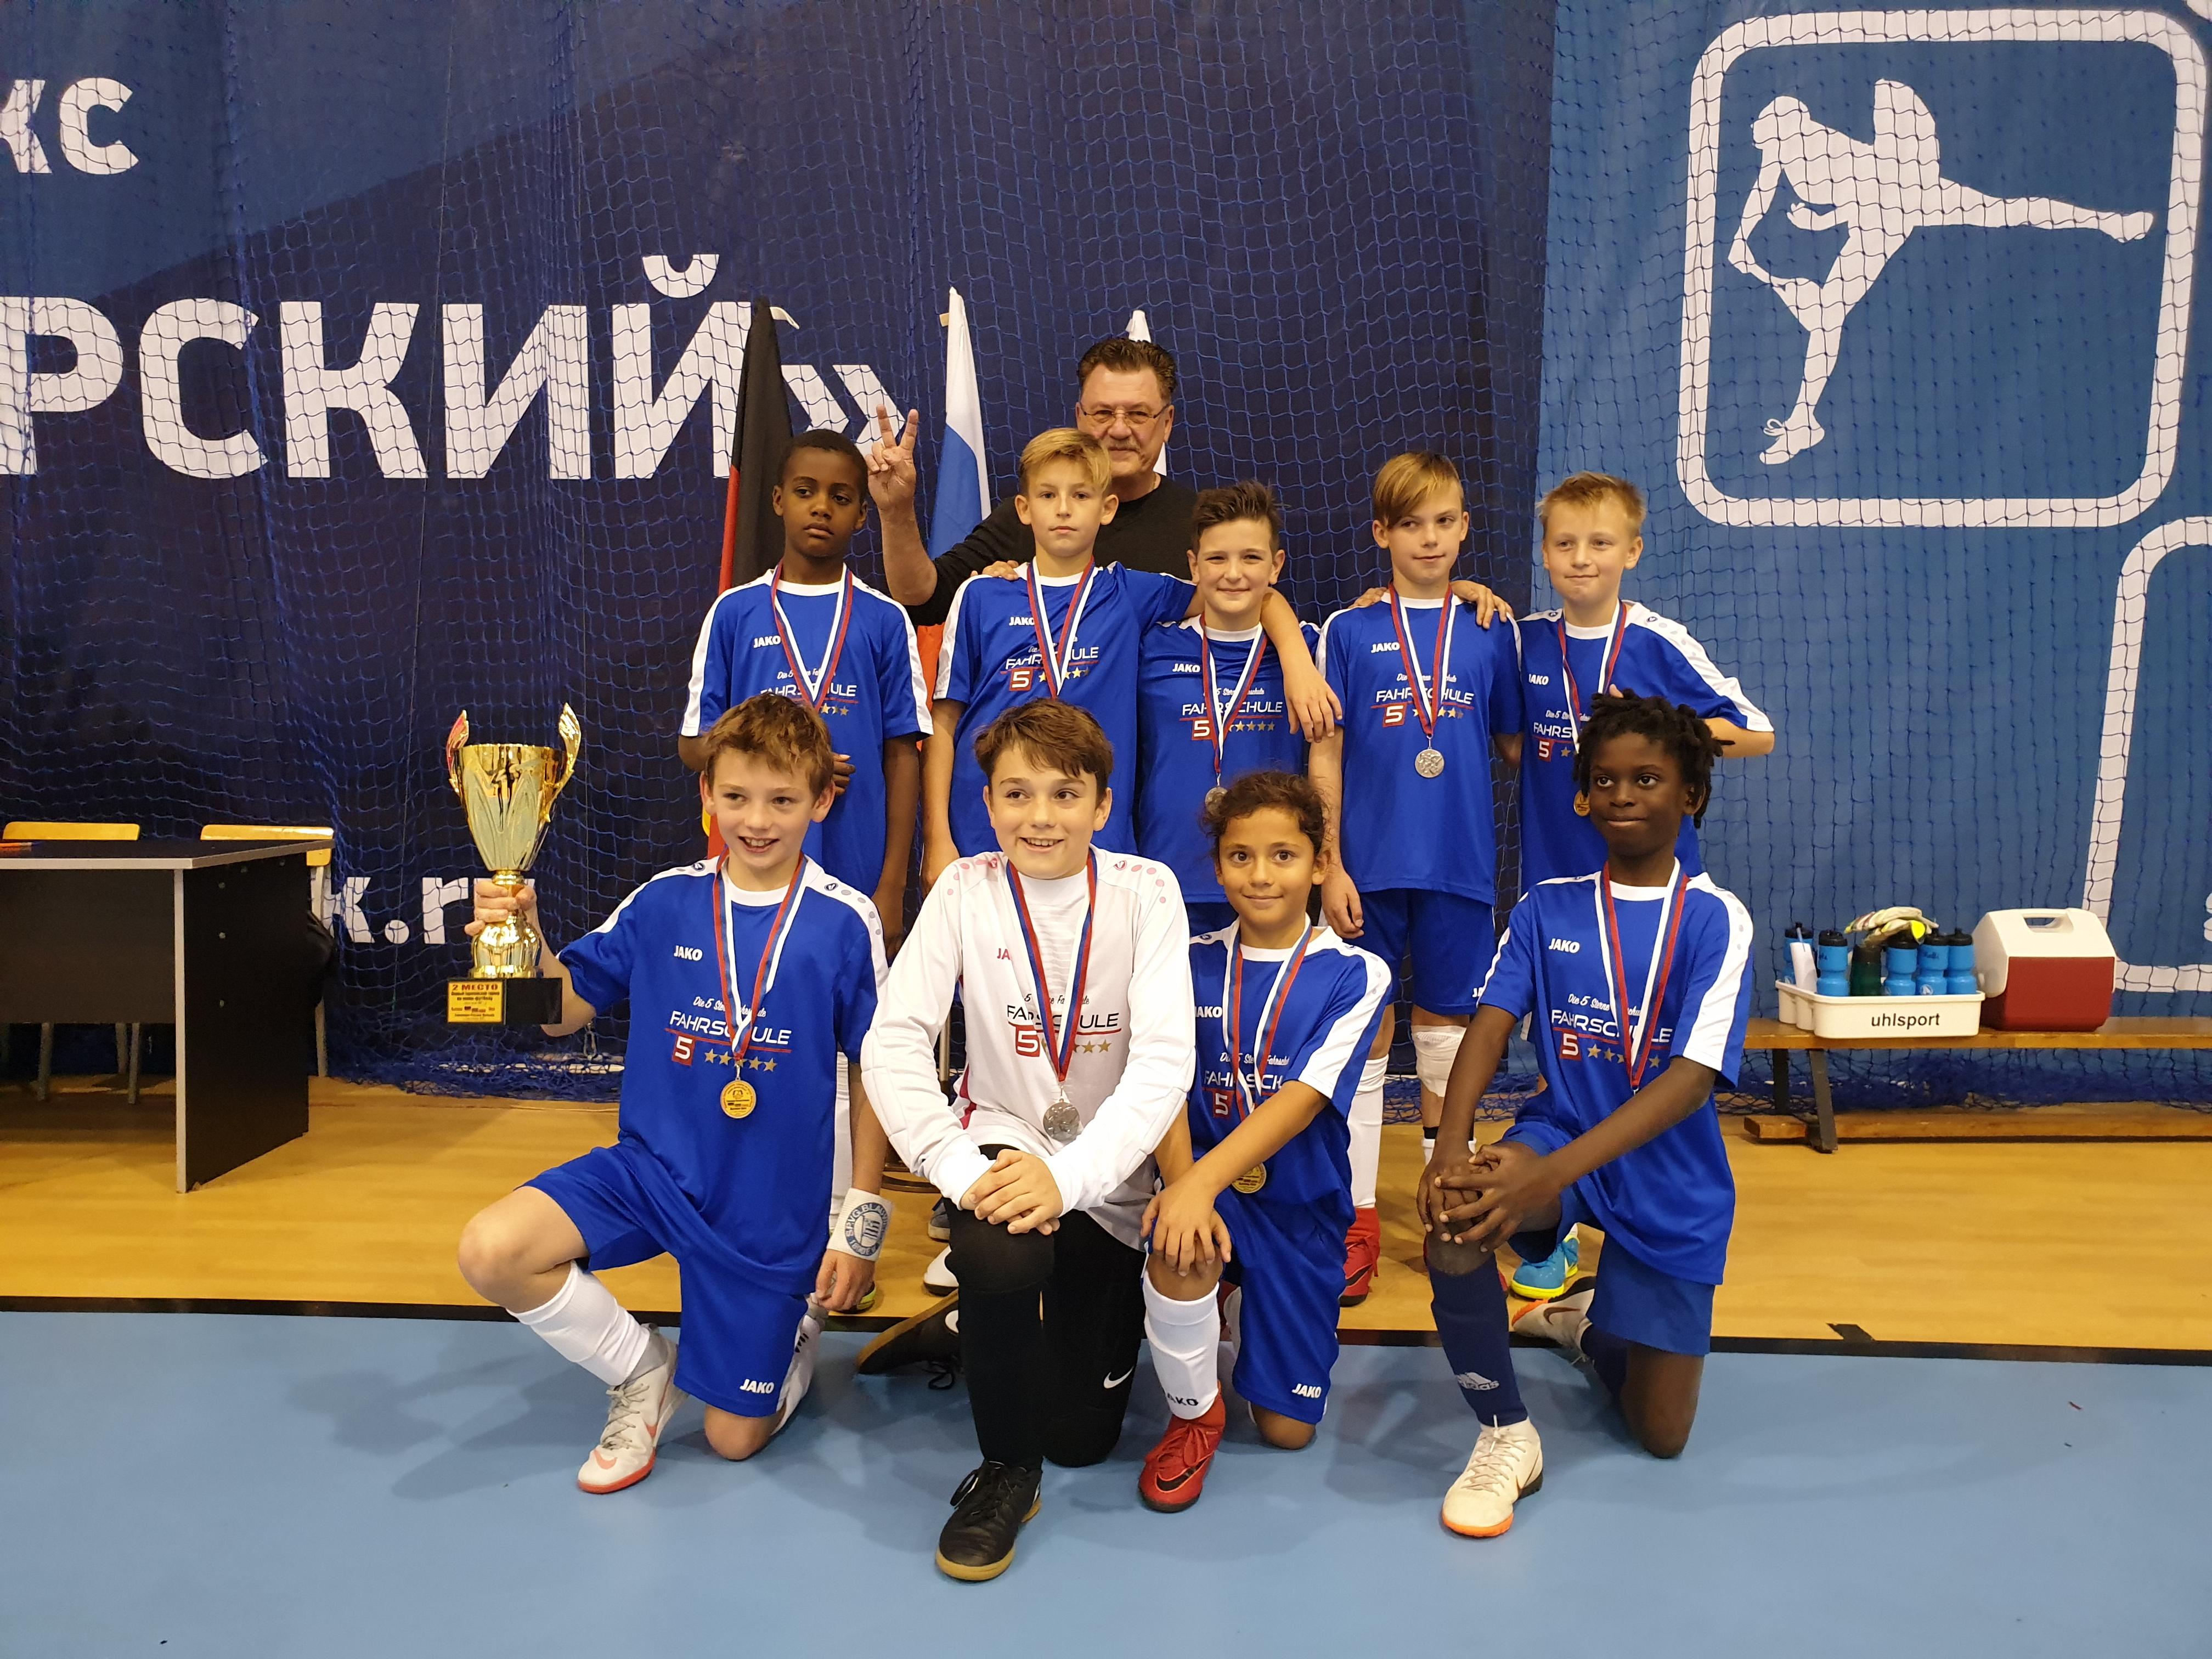 D2 – Unsere Fahrt zum Europäischen Jugendfußball Turnier in Kaliningrad